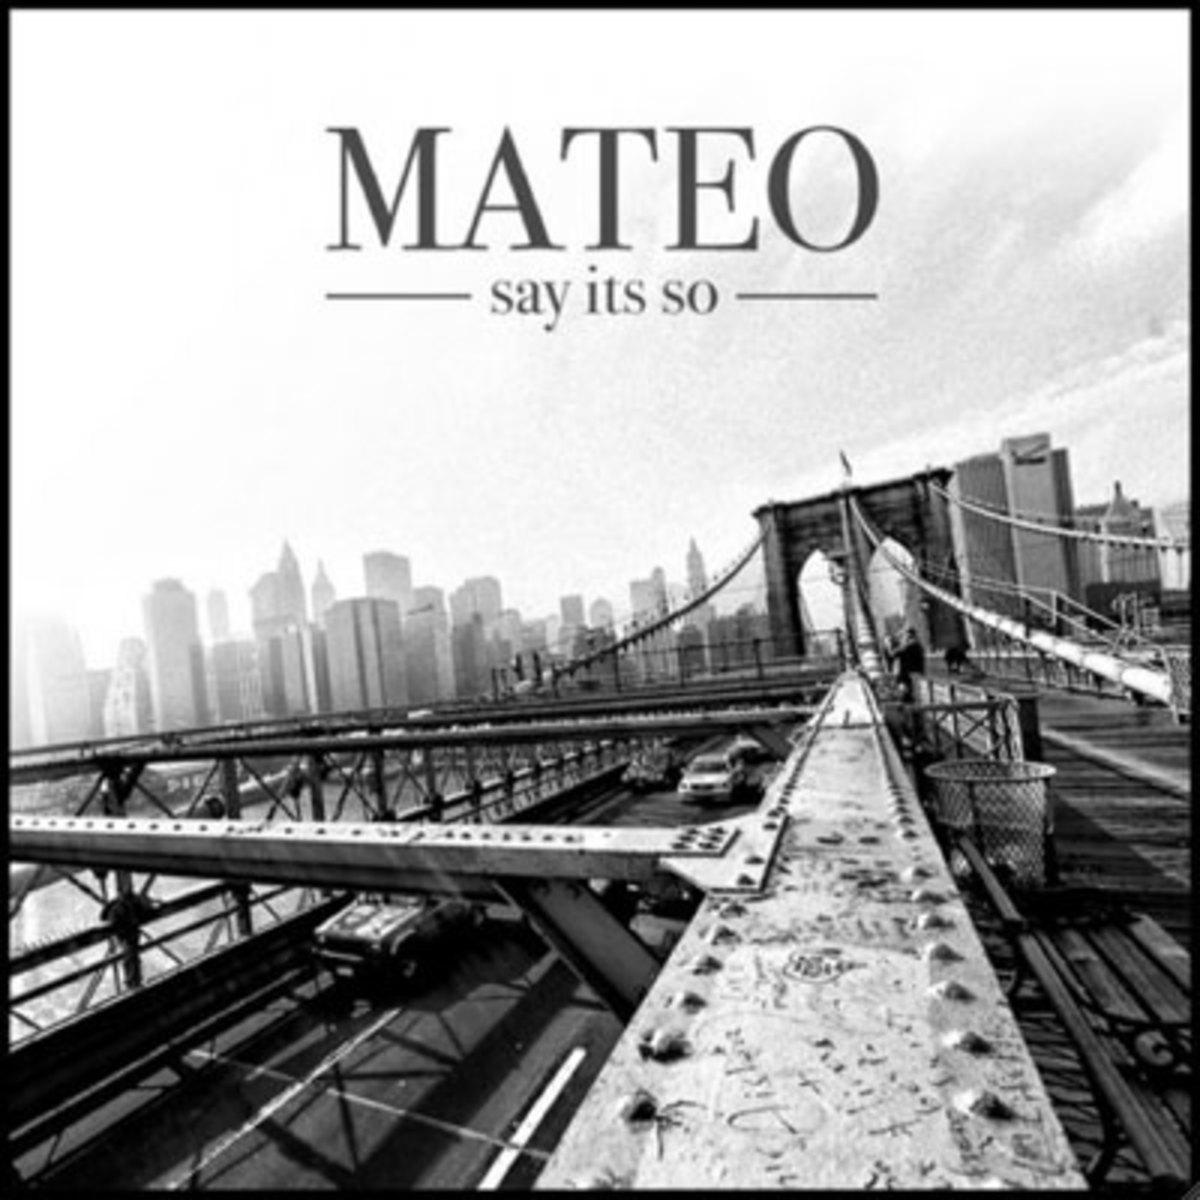 mateo-sayitsso.jpg